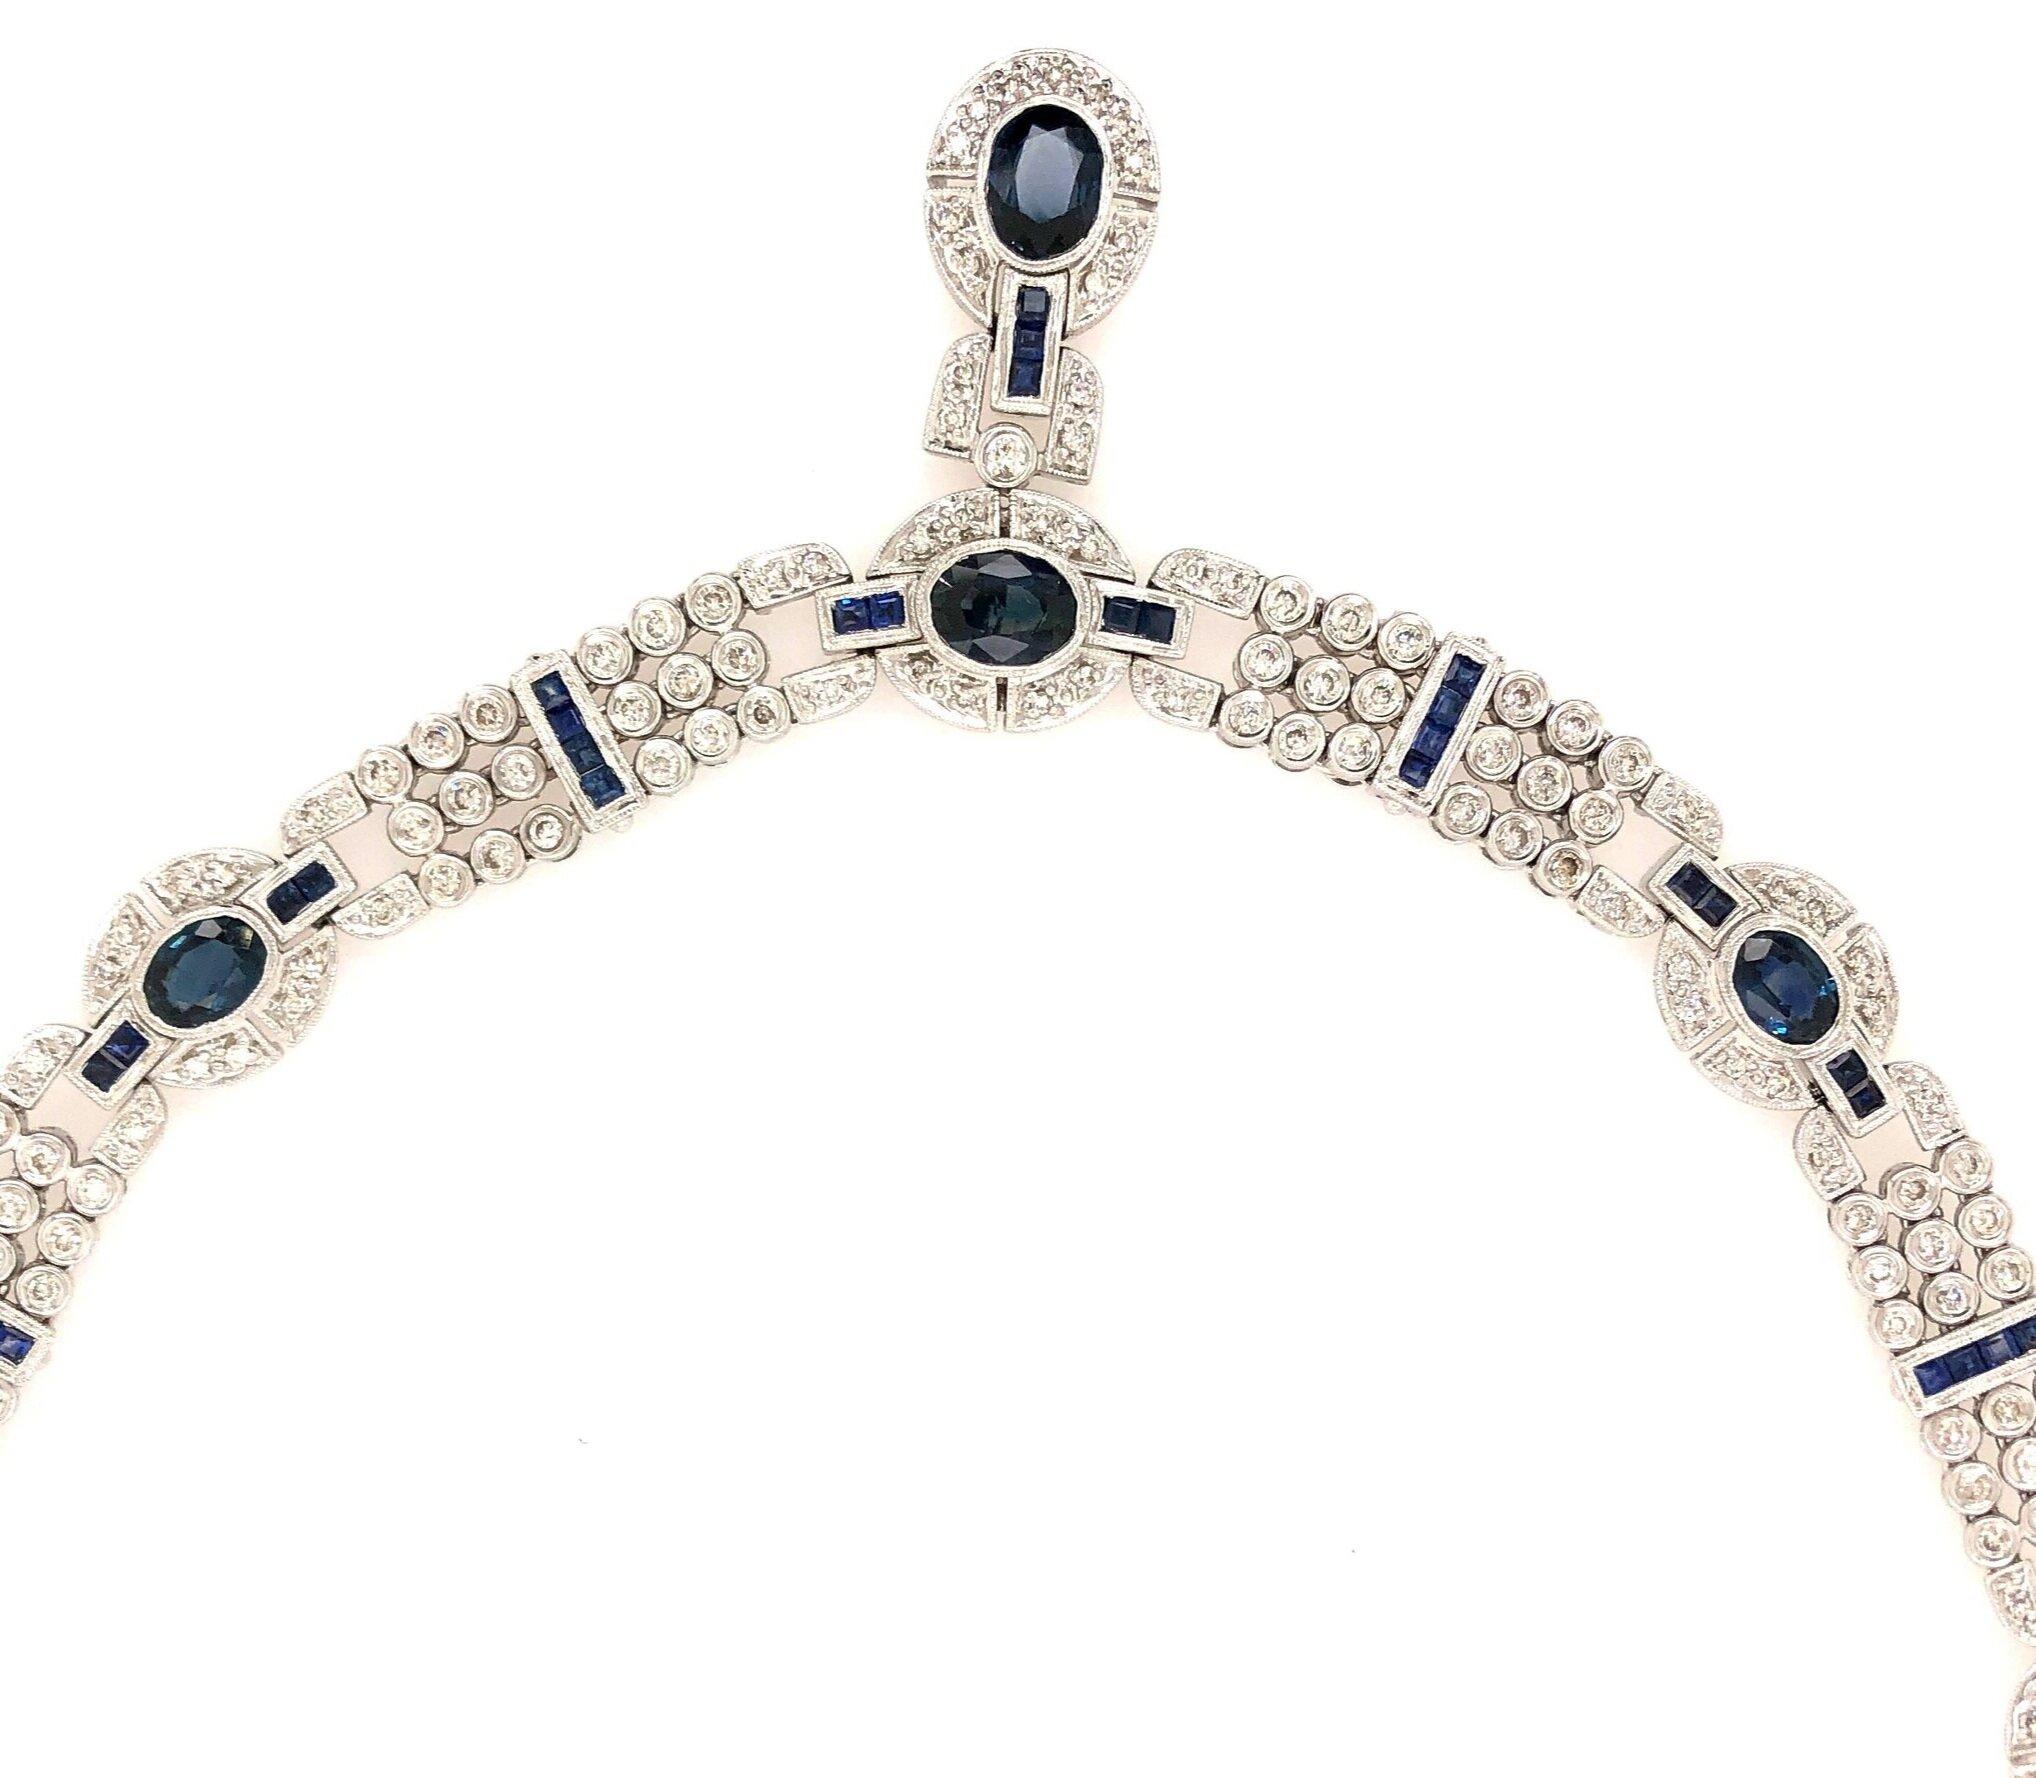 Art Deco Style Sapphire & Diamond Necklace & Earring Set, 18 karat Gold   Est. US$ 5,000-7,000 with Earrings